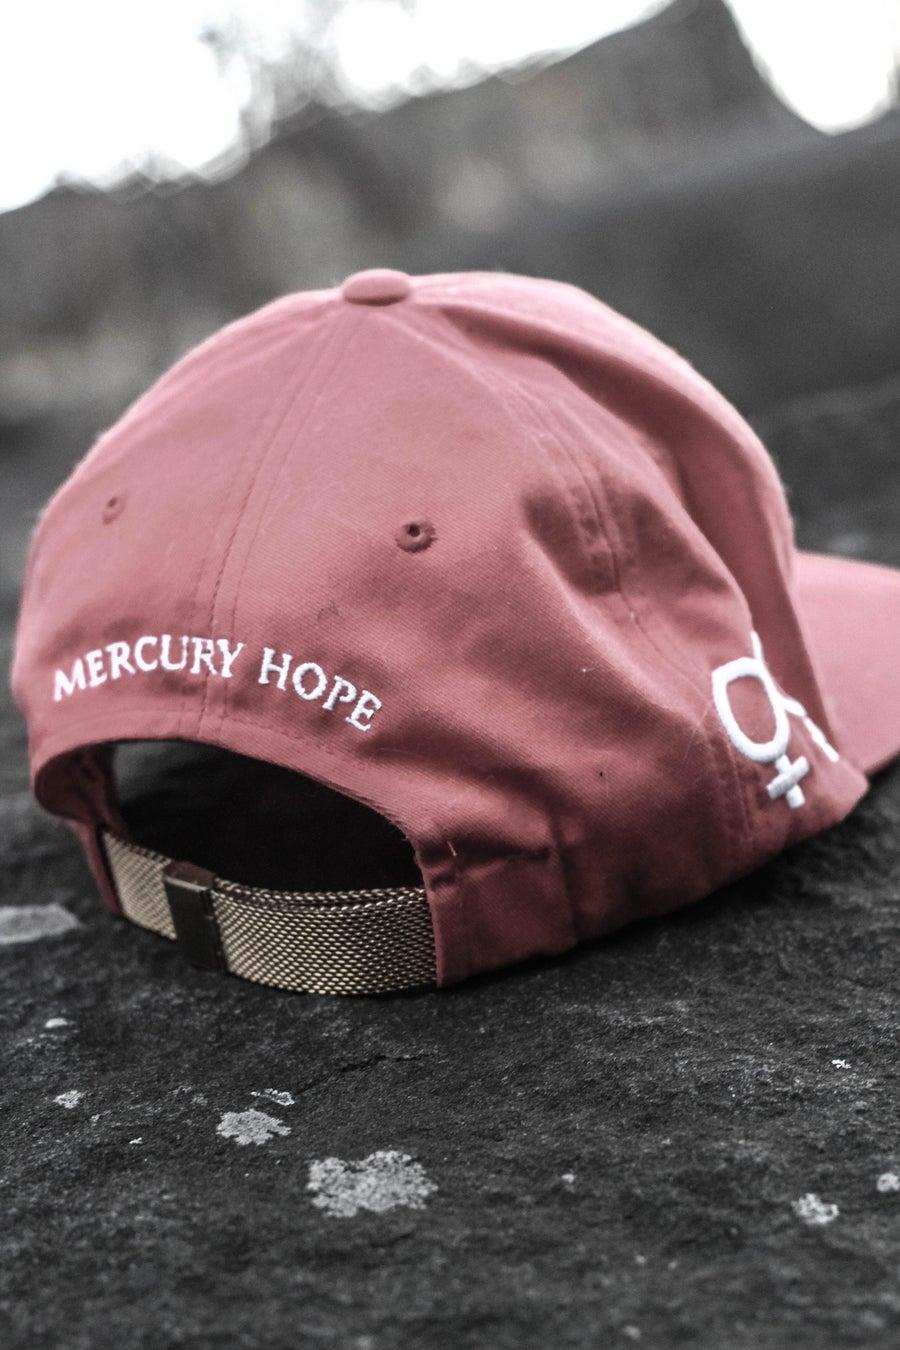 Image of Red Signature Mercury Hope SnapBack Gold 18K Plated